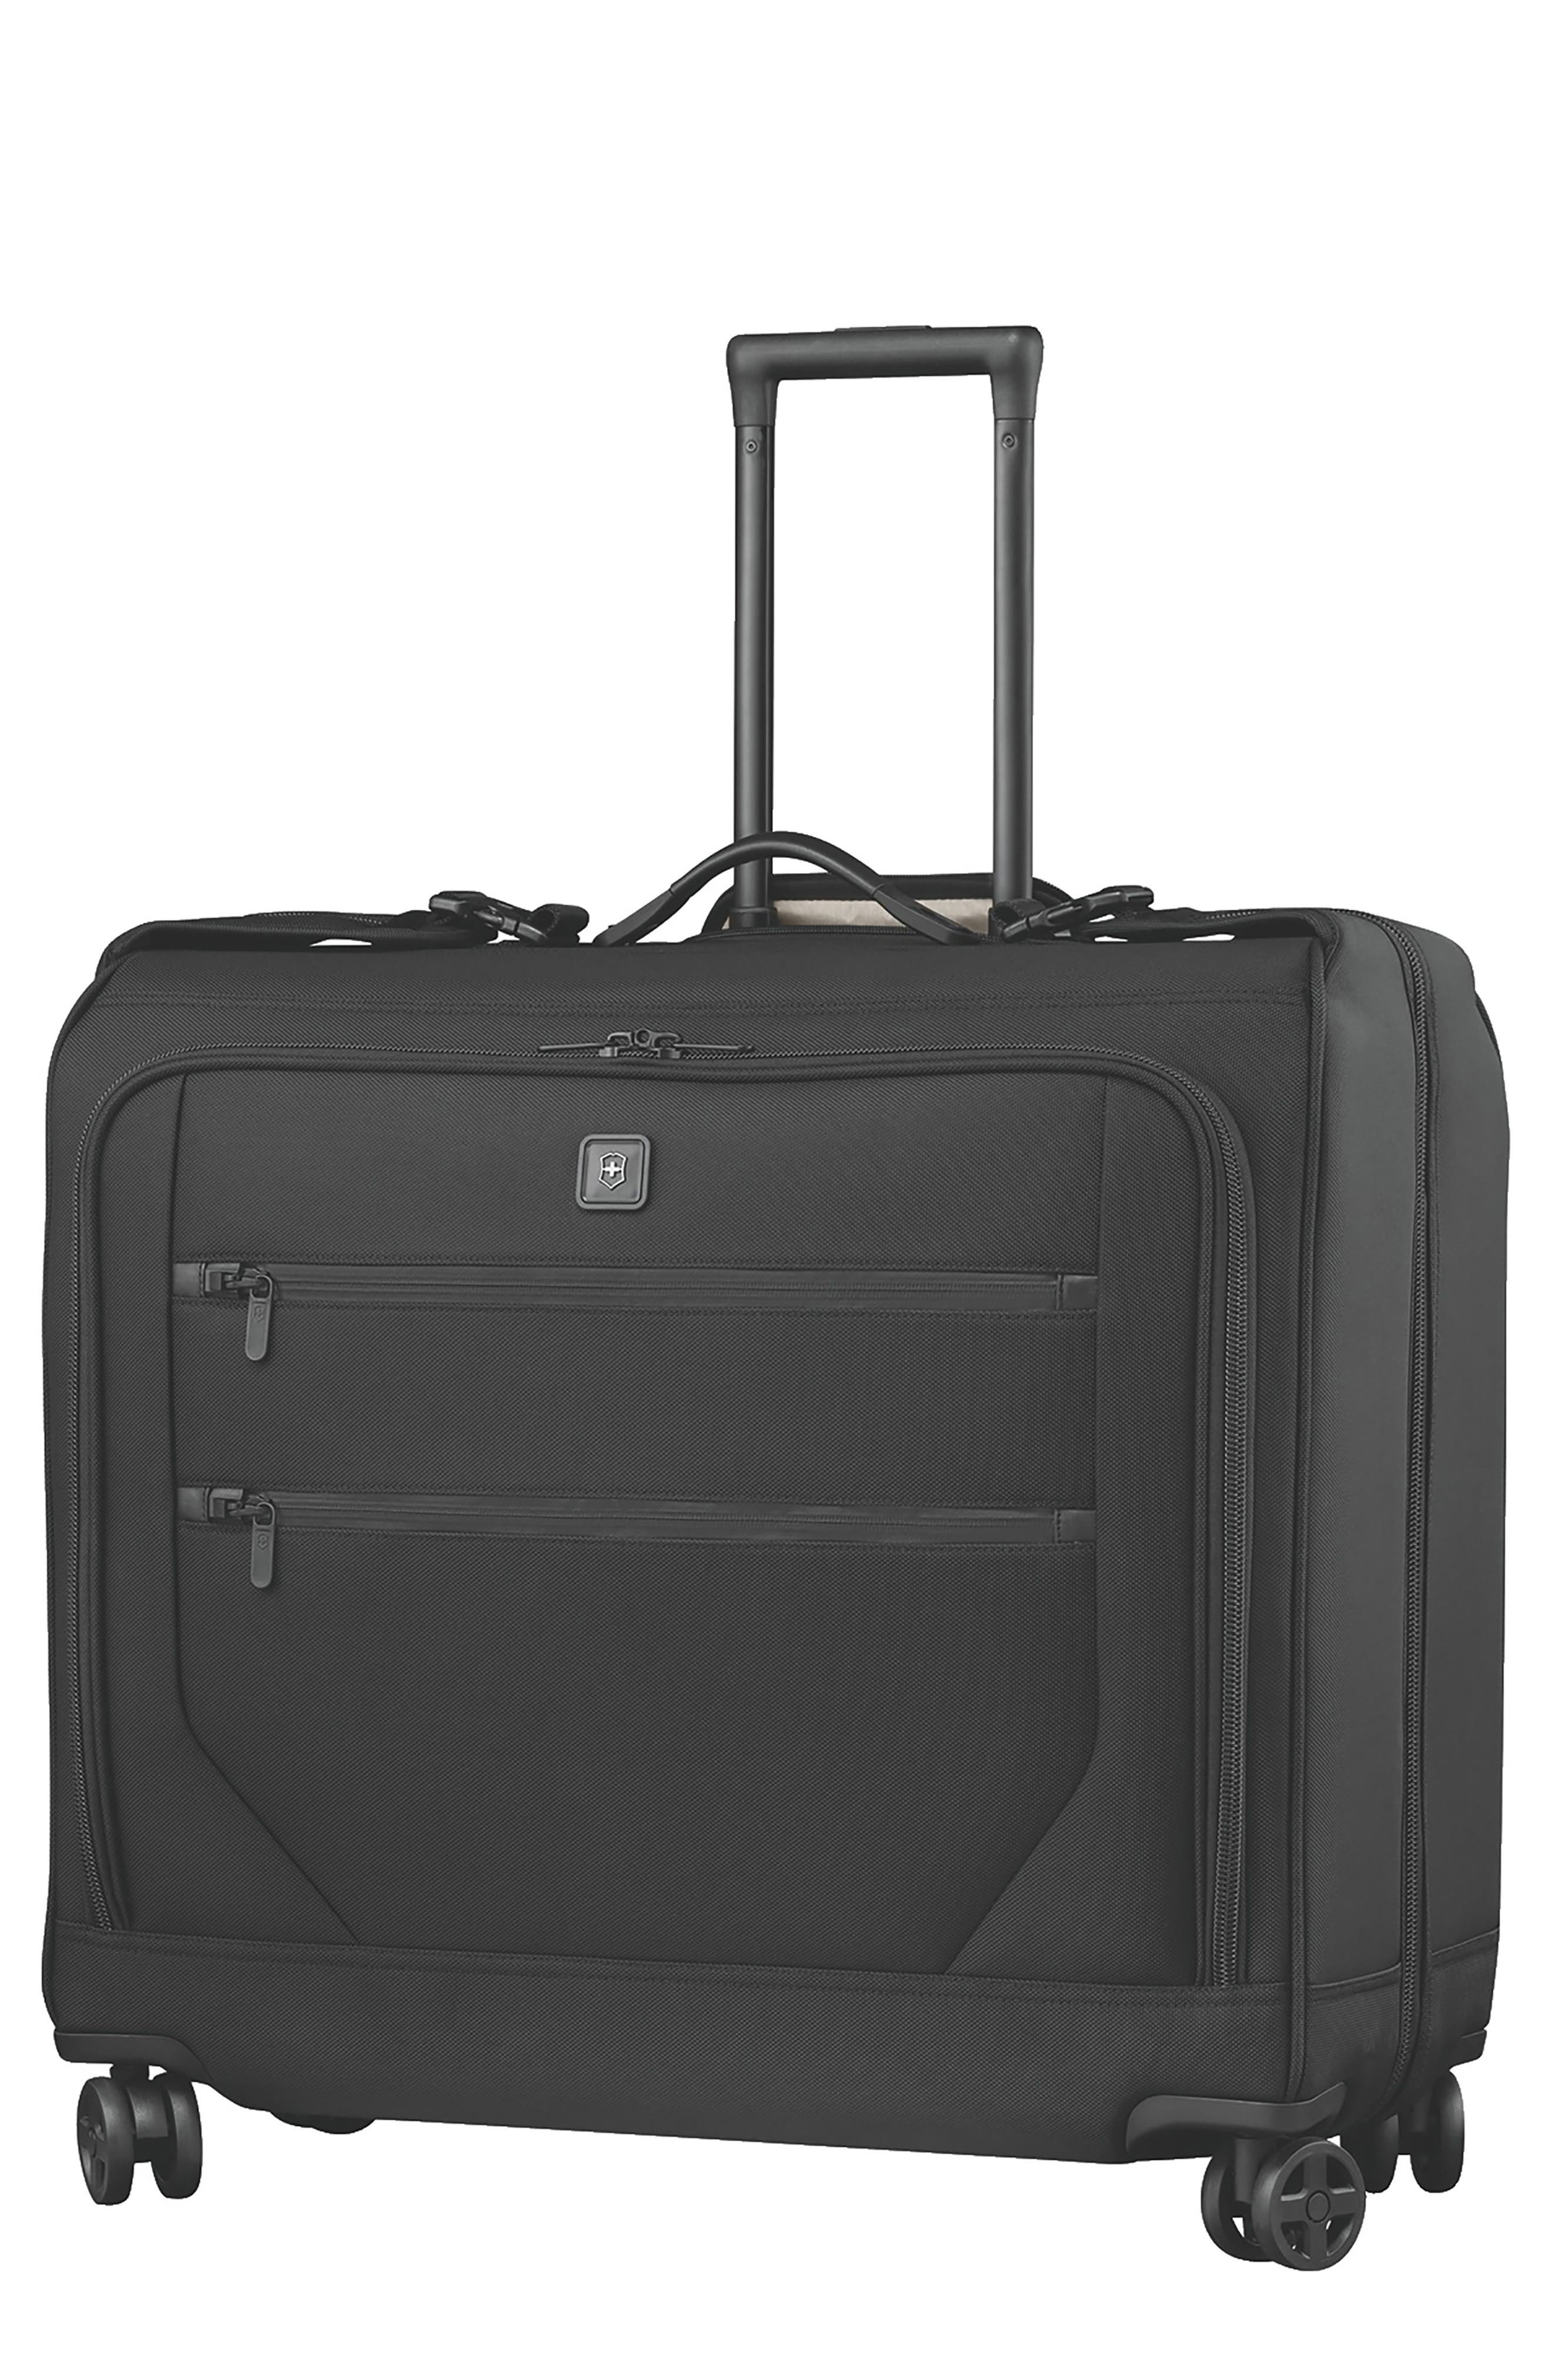 Lexicon 2.0 Wheeled Garment Bag,                         Main,                         color, 001